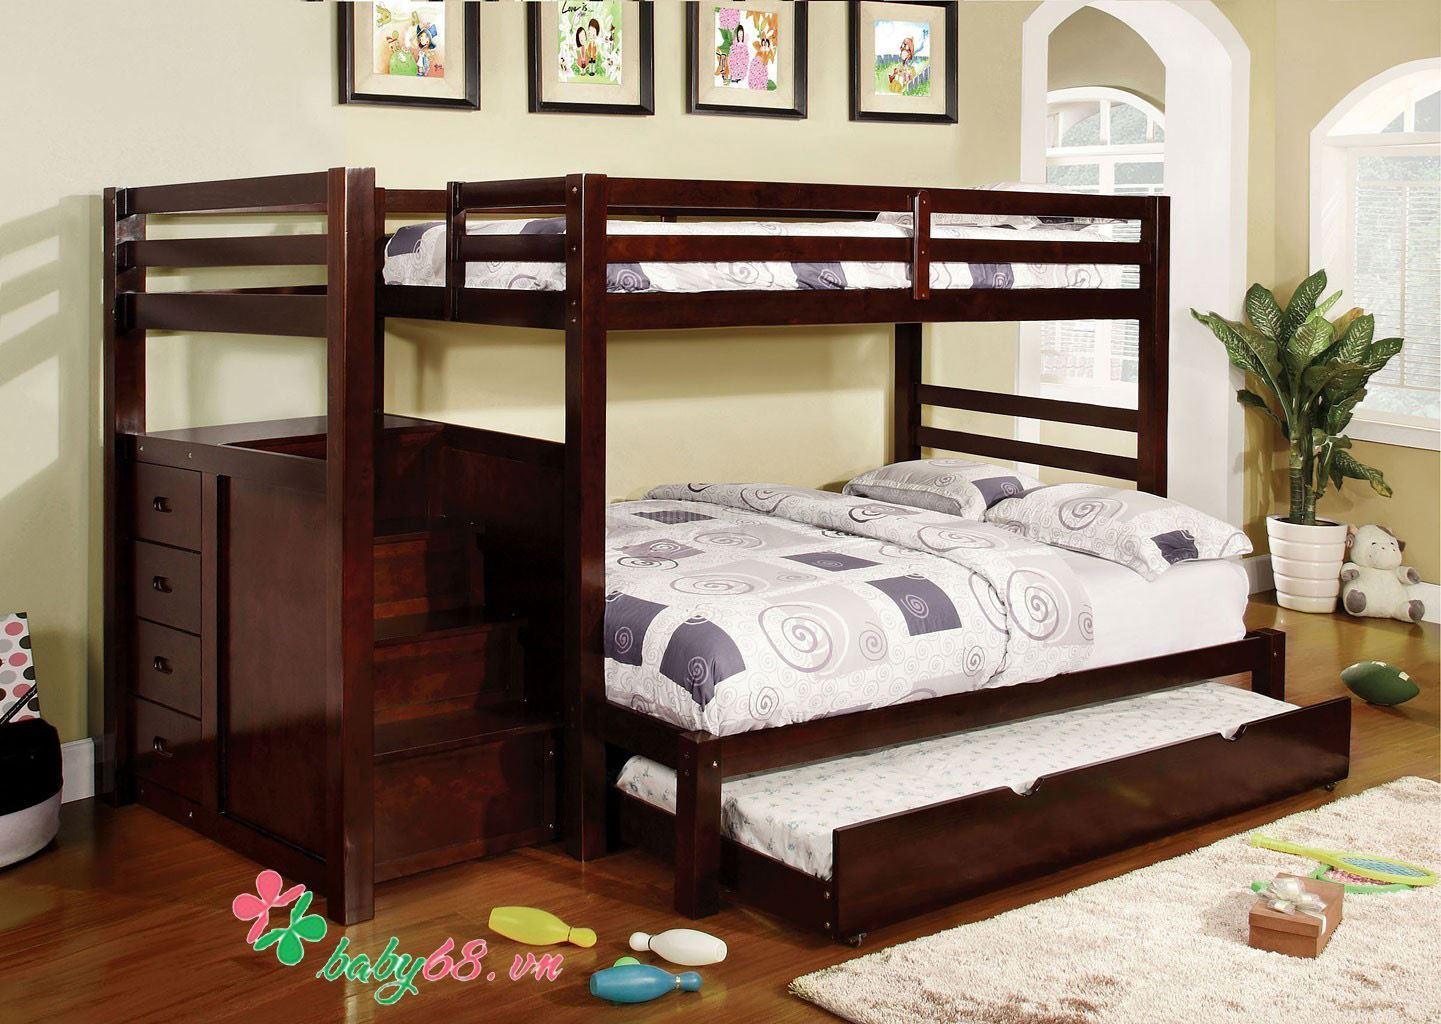 Giường Tầng Giường Cũi Giường Tầng Trẻ Em